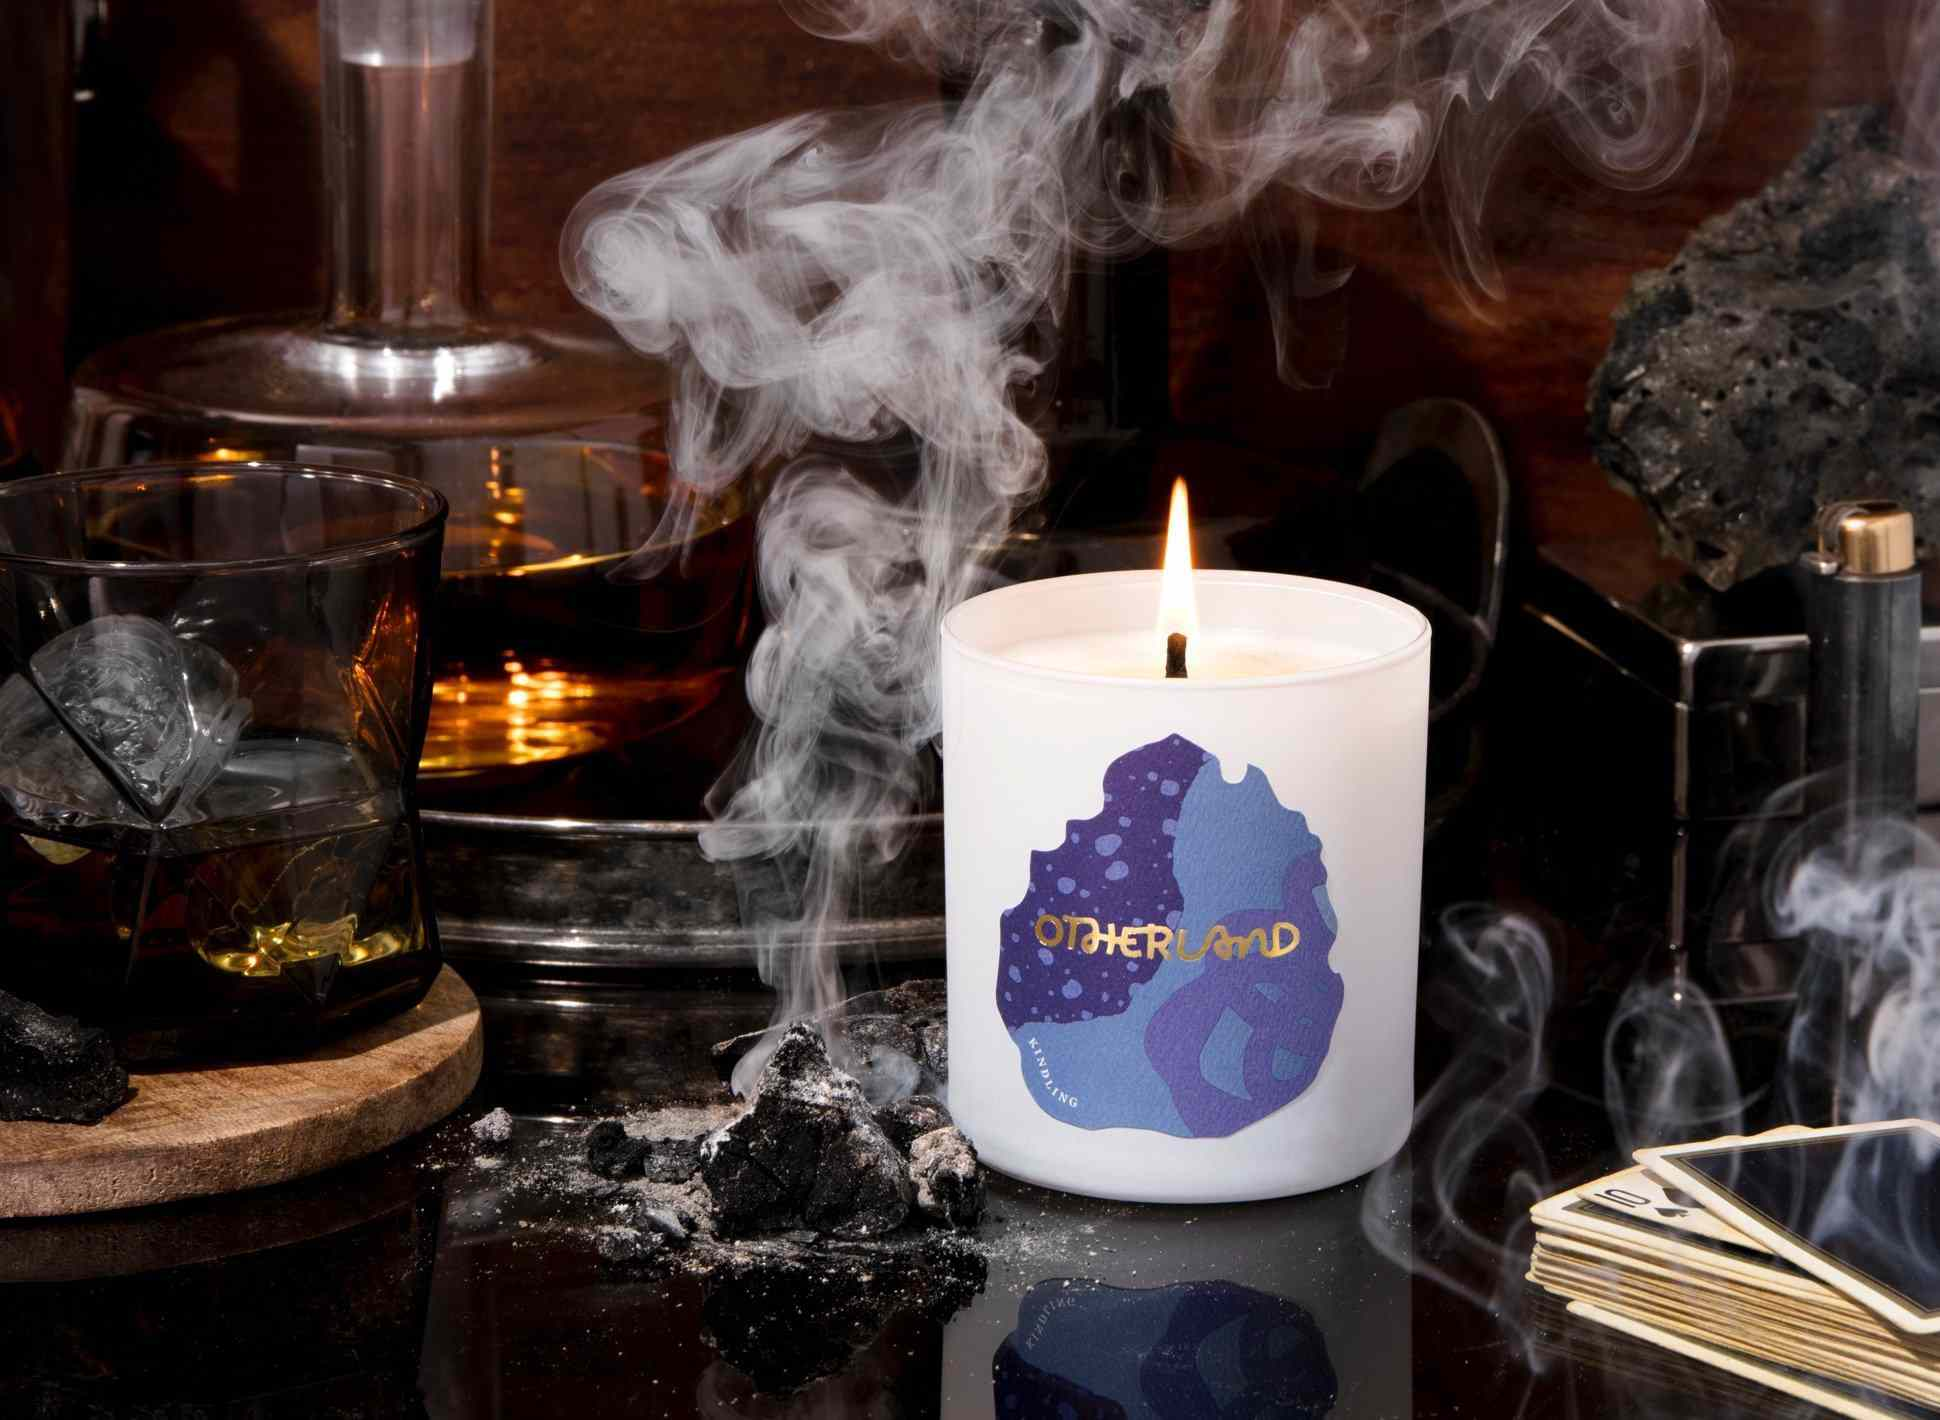 Otherland Kindling Candle